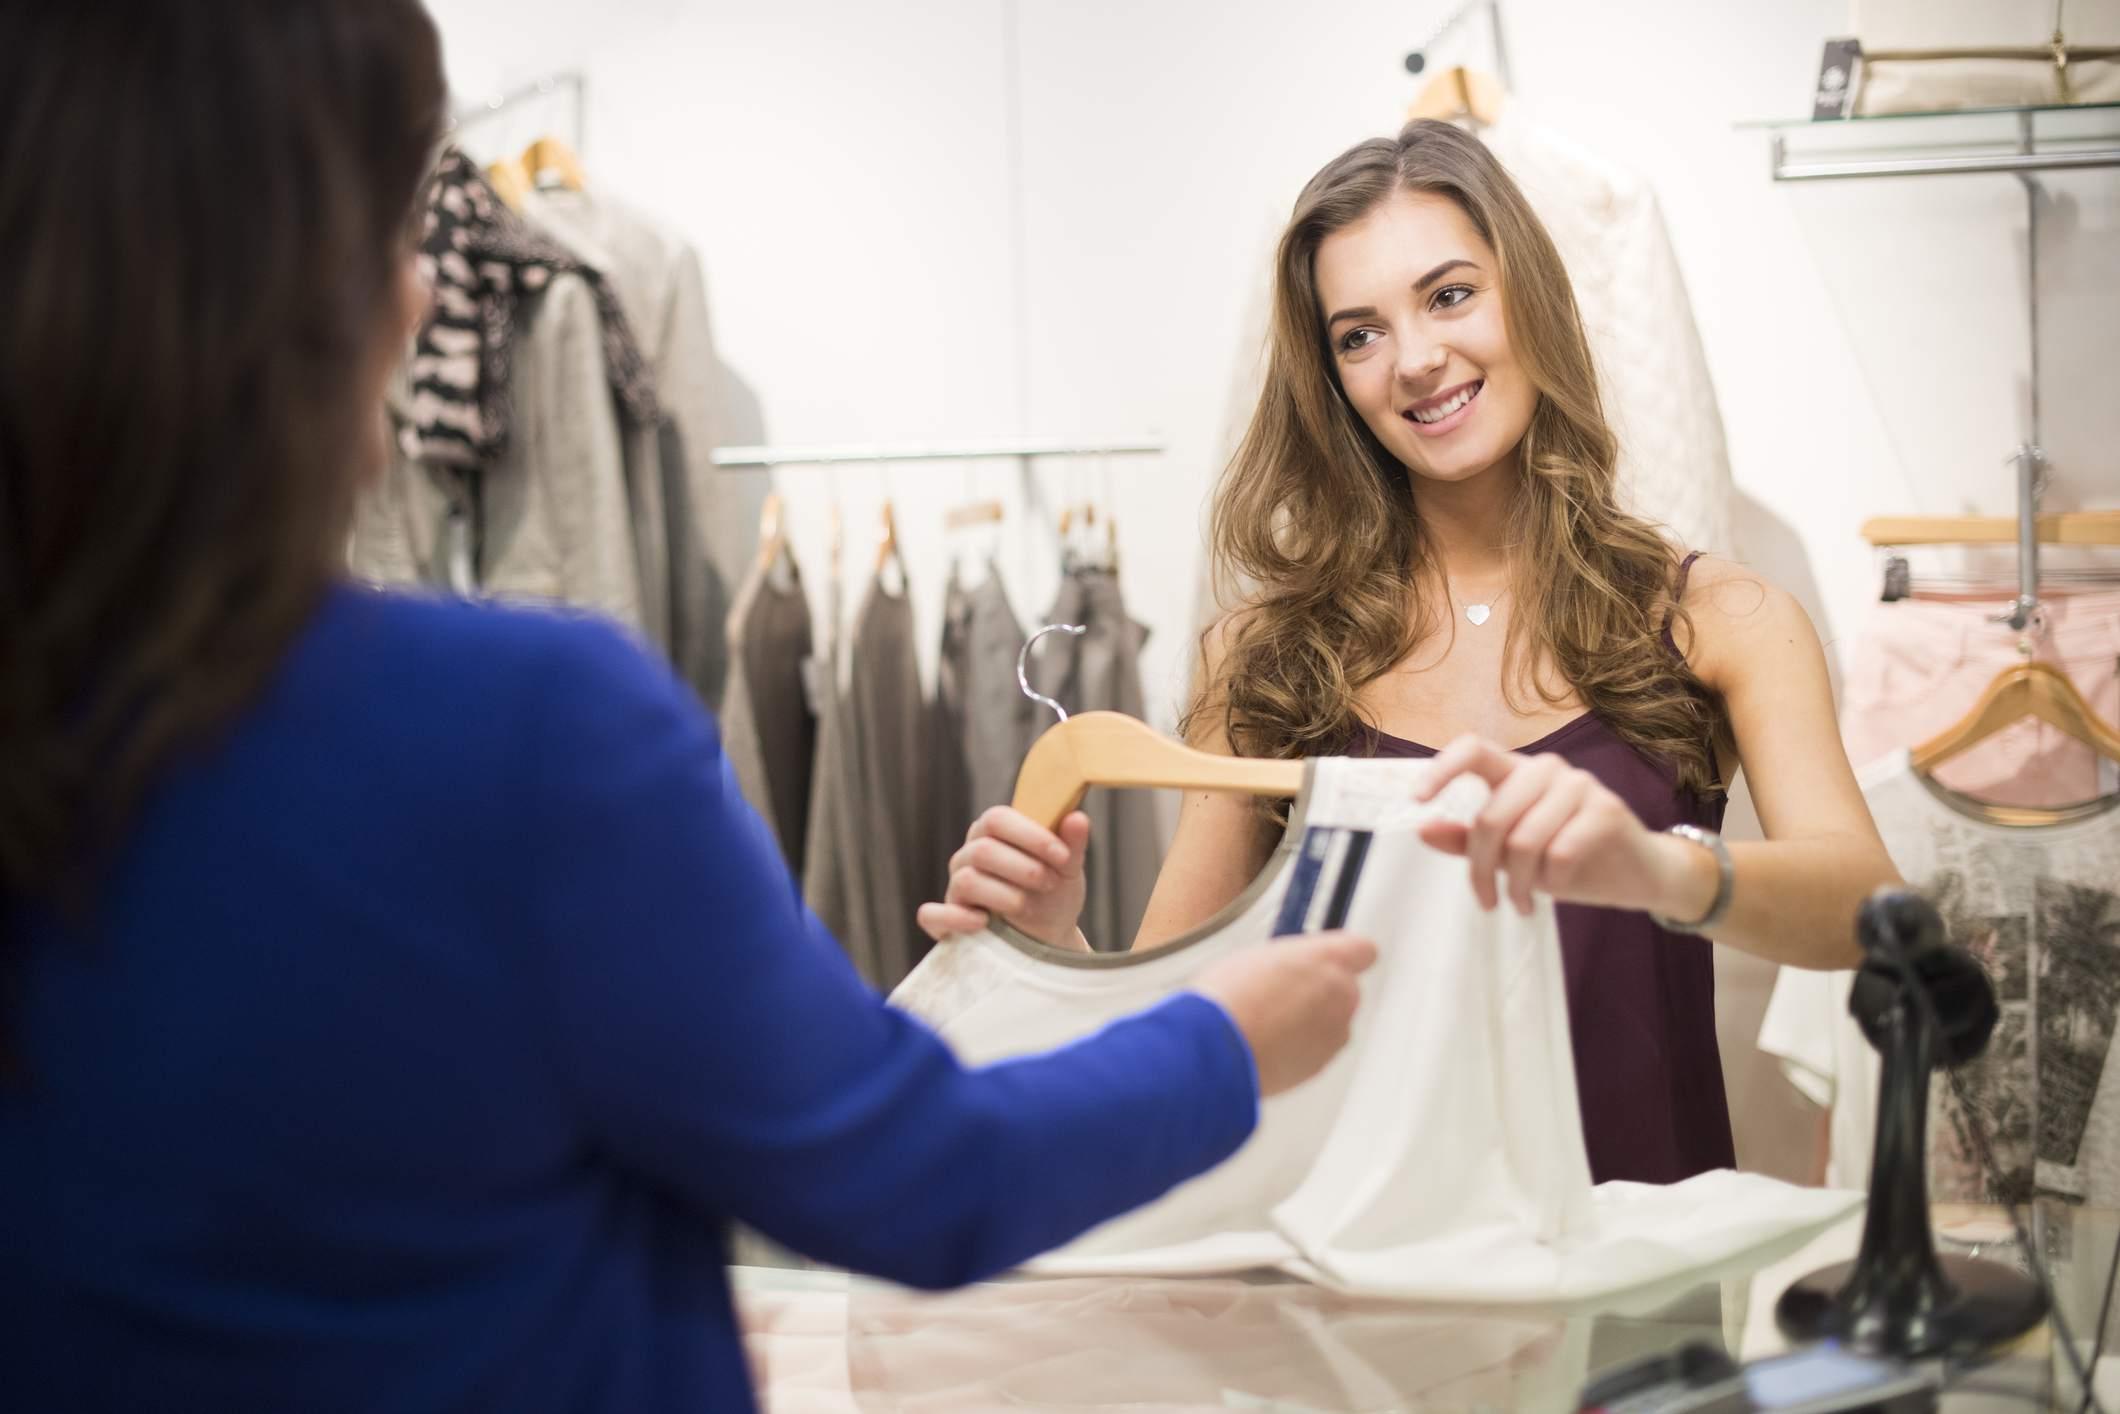 young sales assistnat smiling to customer